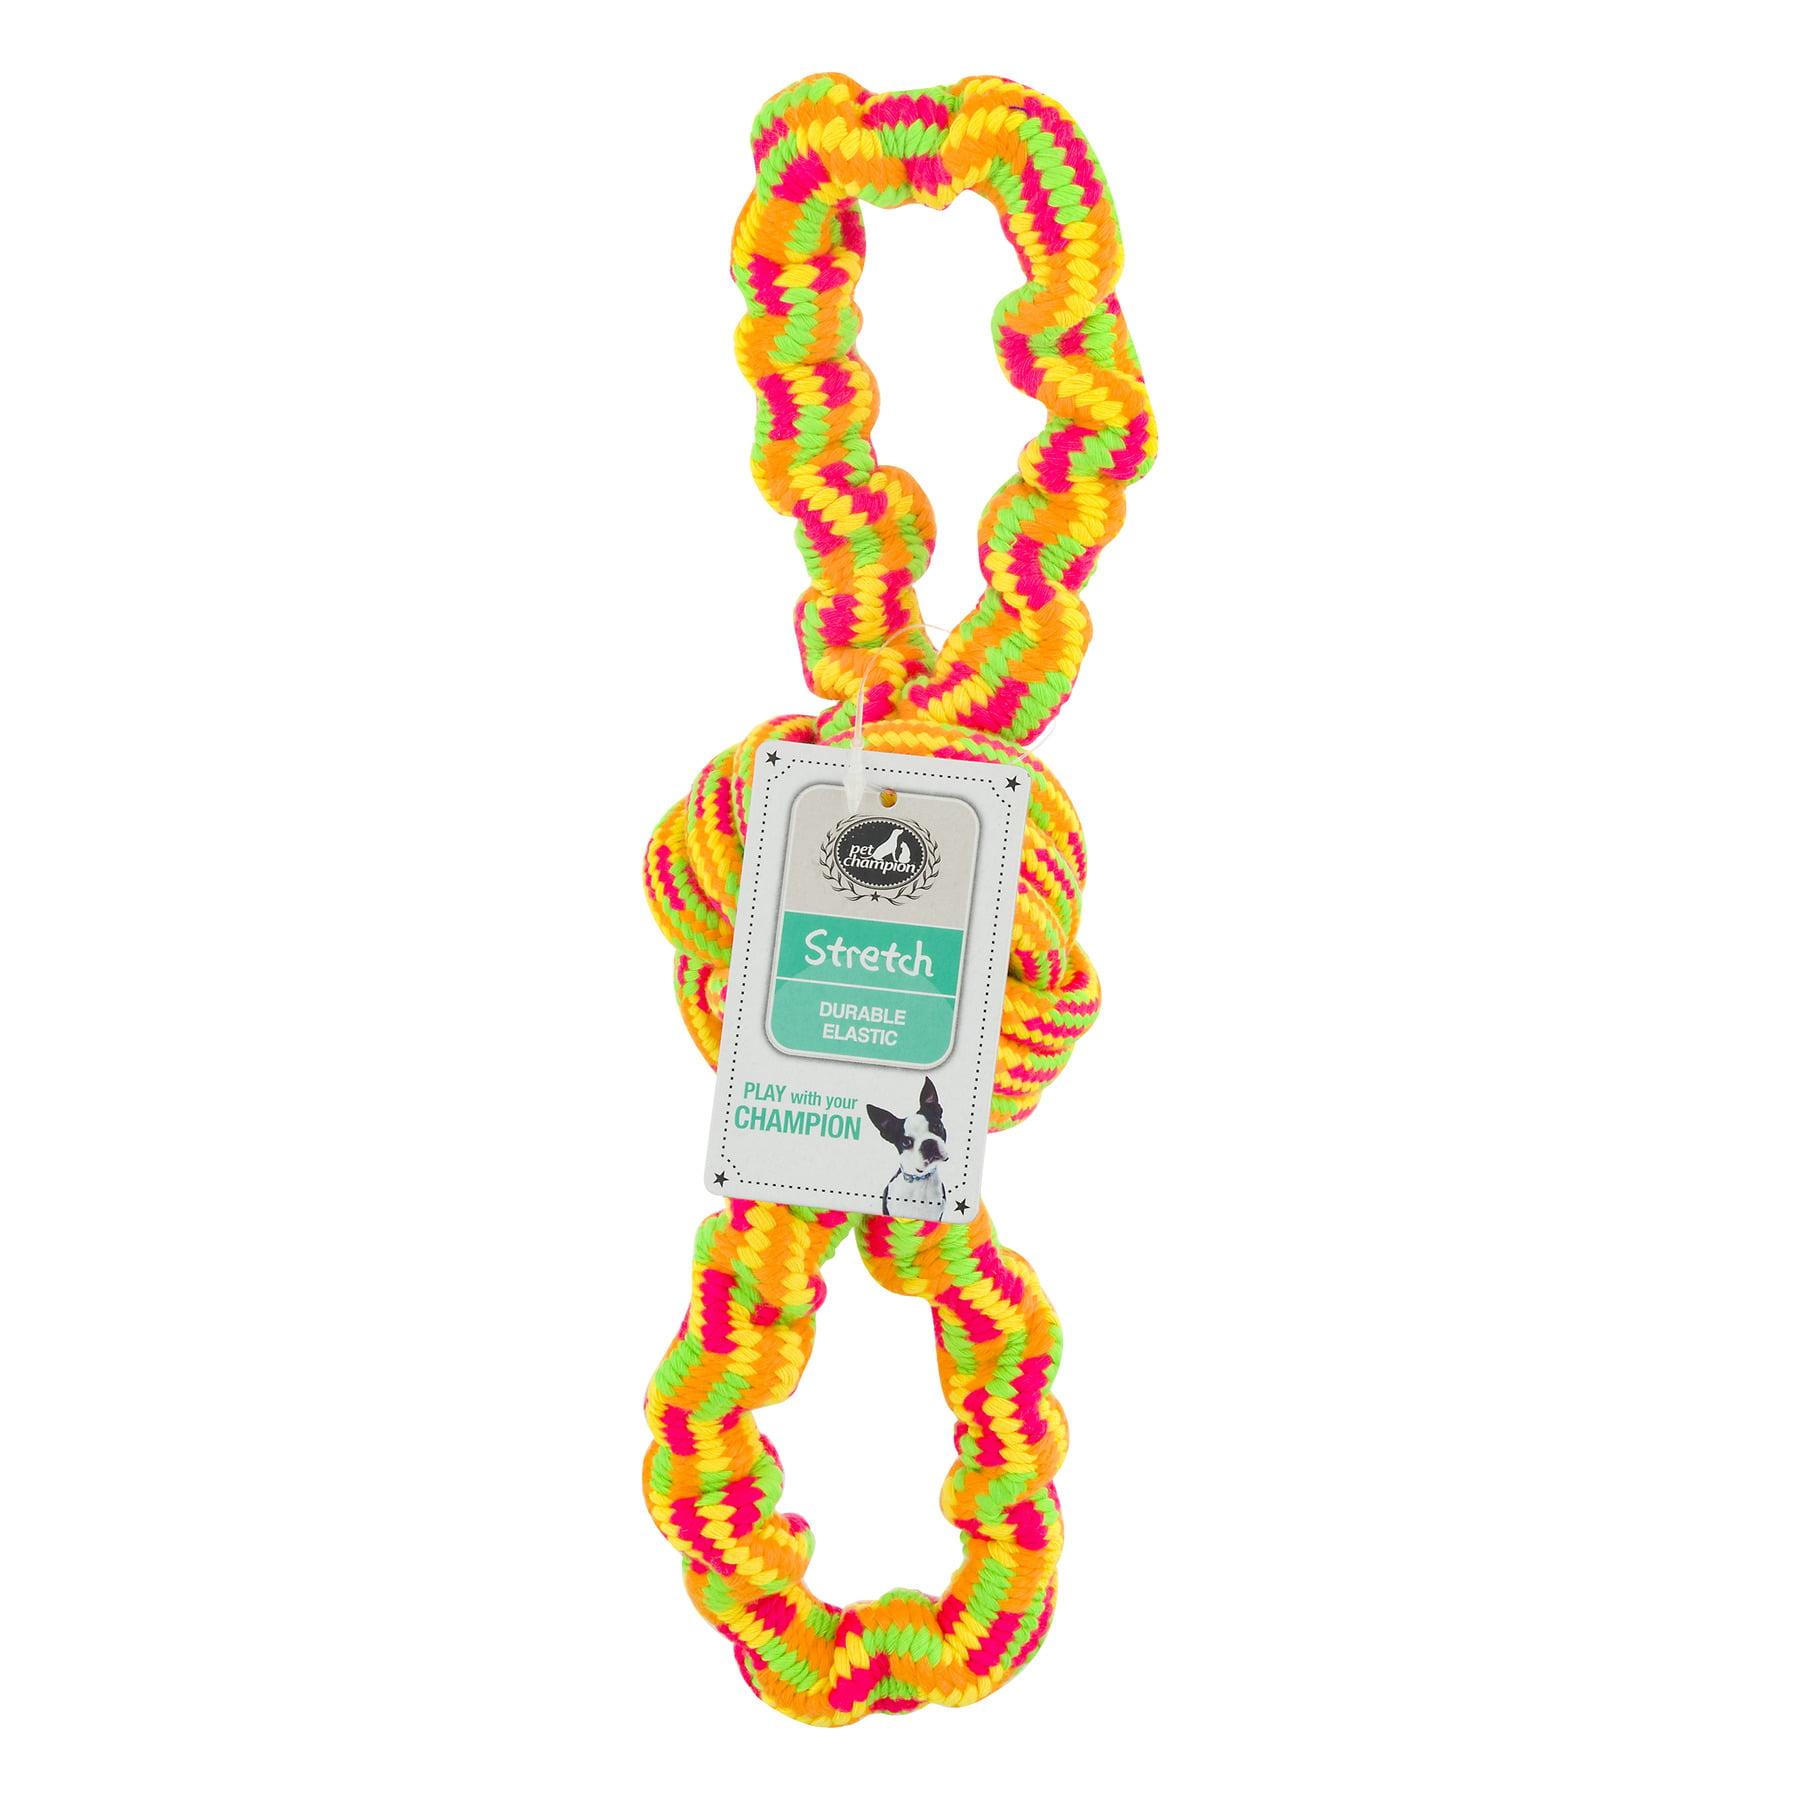 Pet Champion Stretch Rope Dog Toy, 1.0 CT by Stout Stuff, LLC